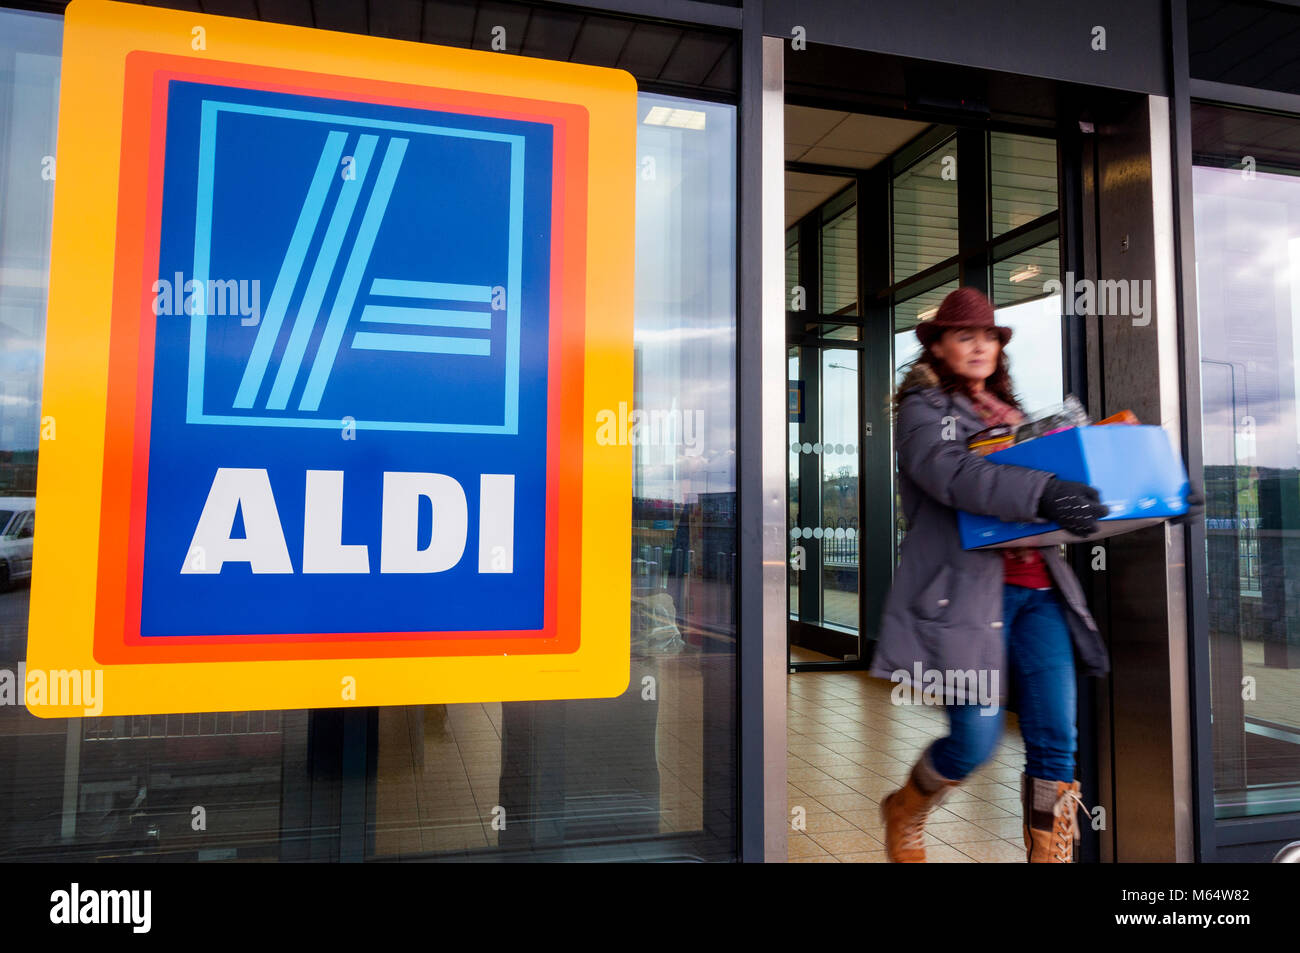 Frau mit Box shopping verlässt Aldi Stores in Letterkenny, County Donegal, Irland Stockfoto